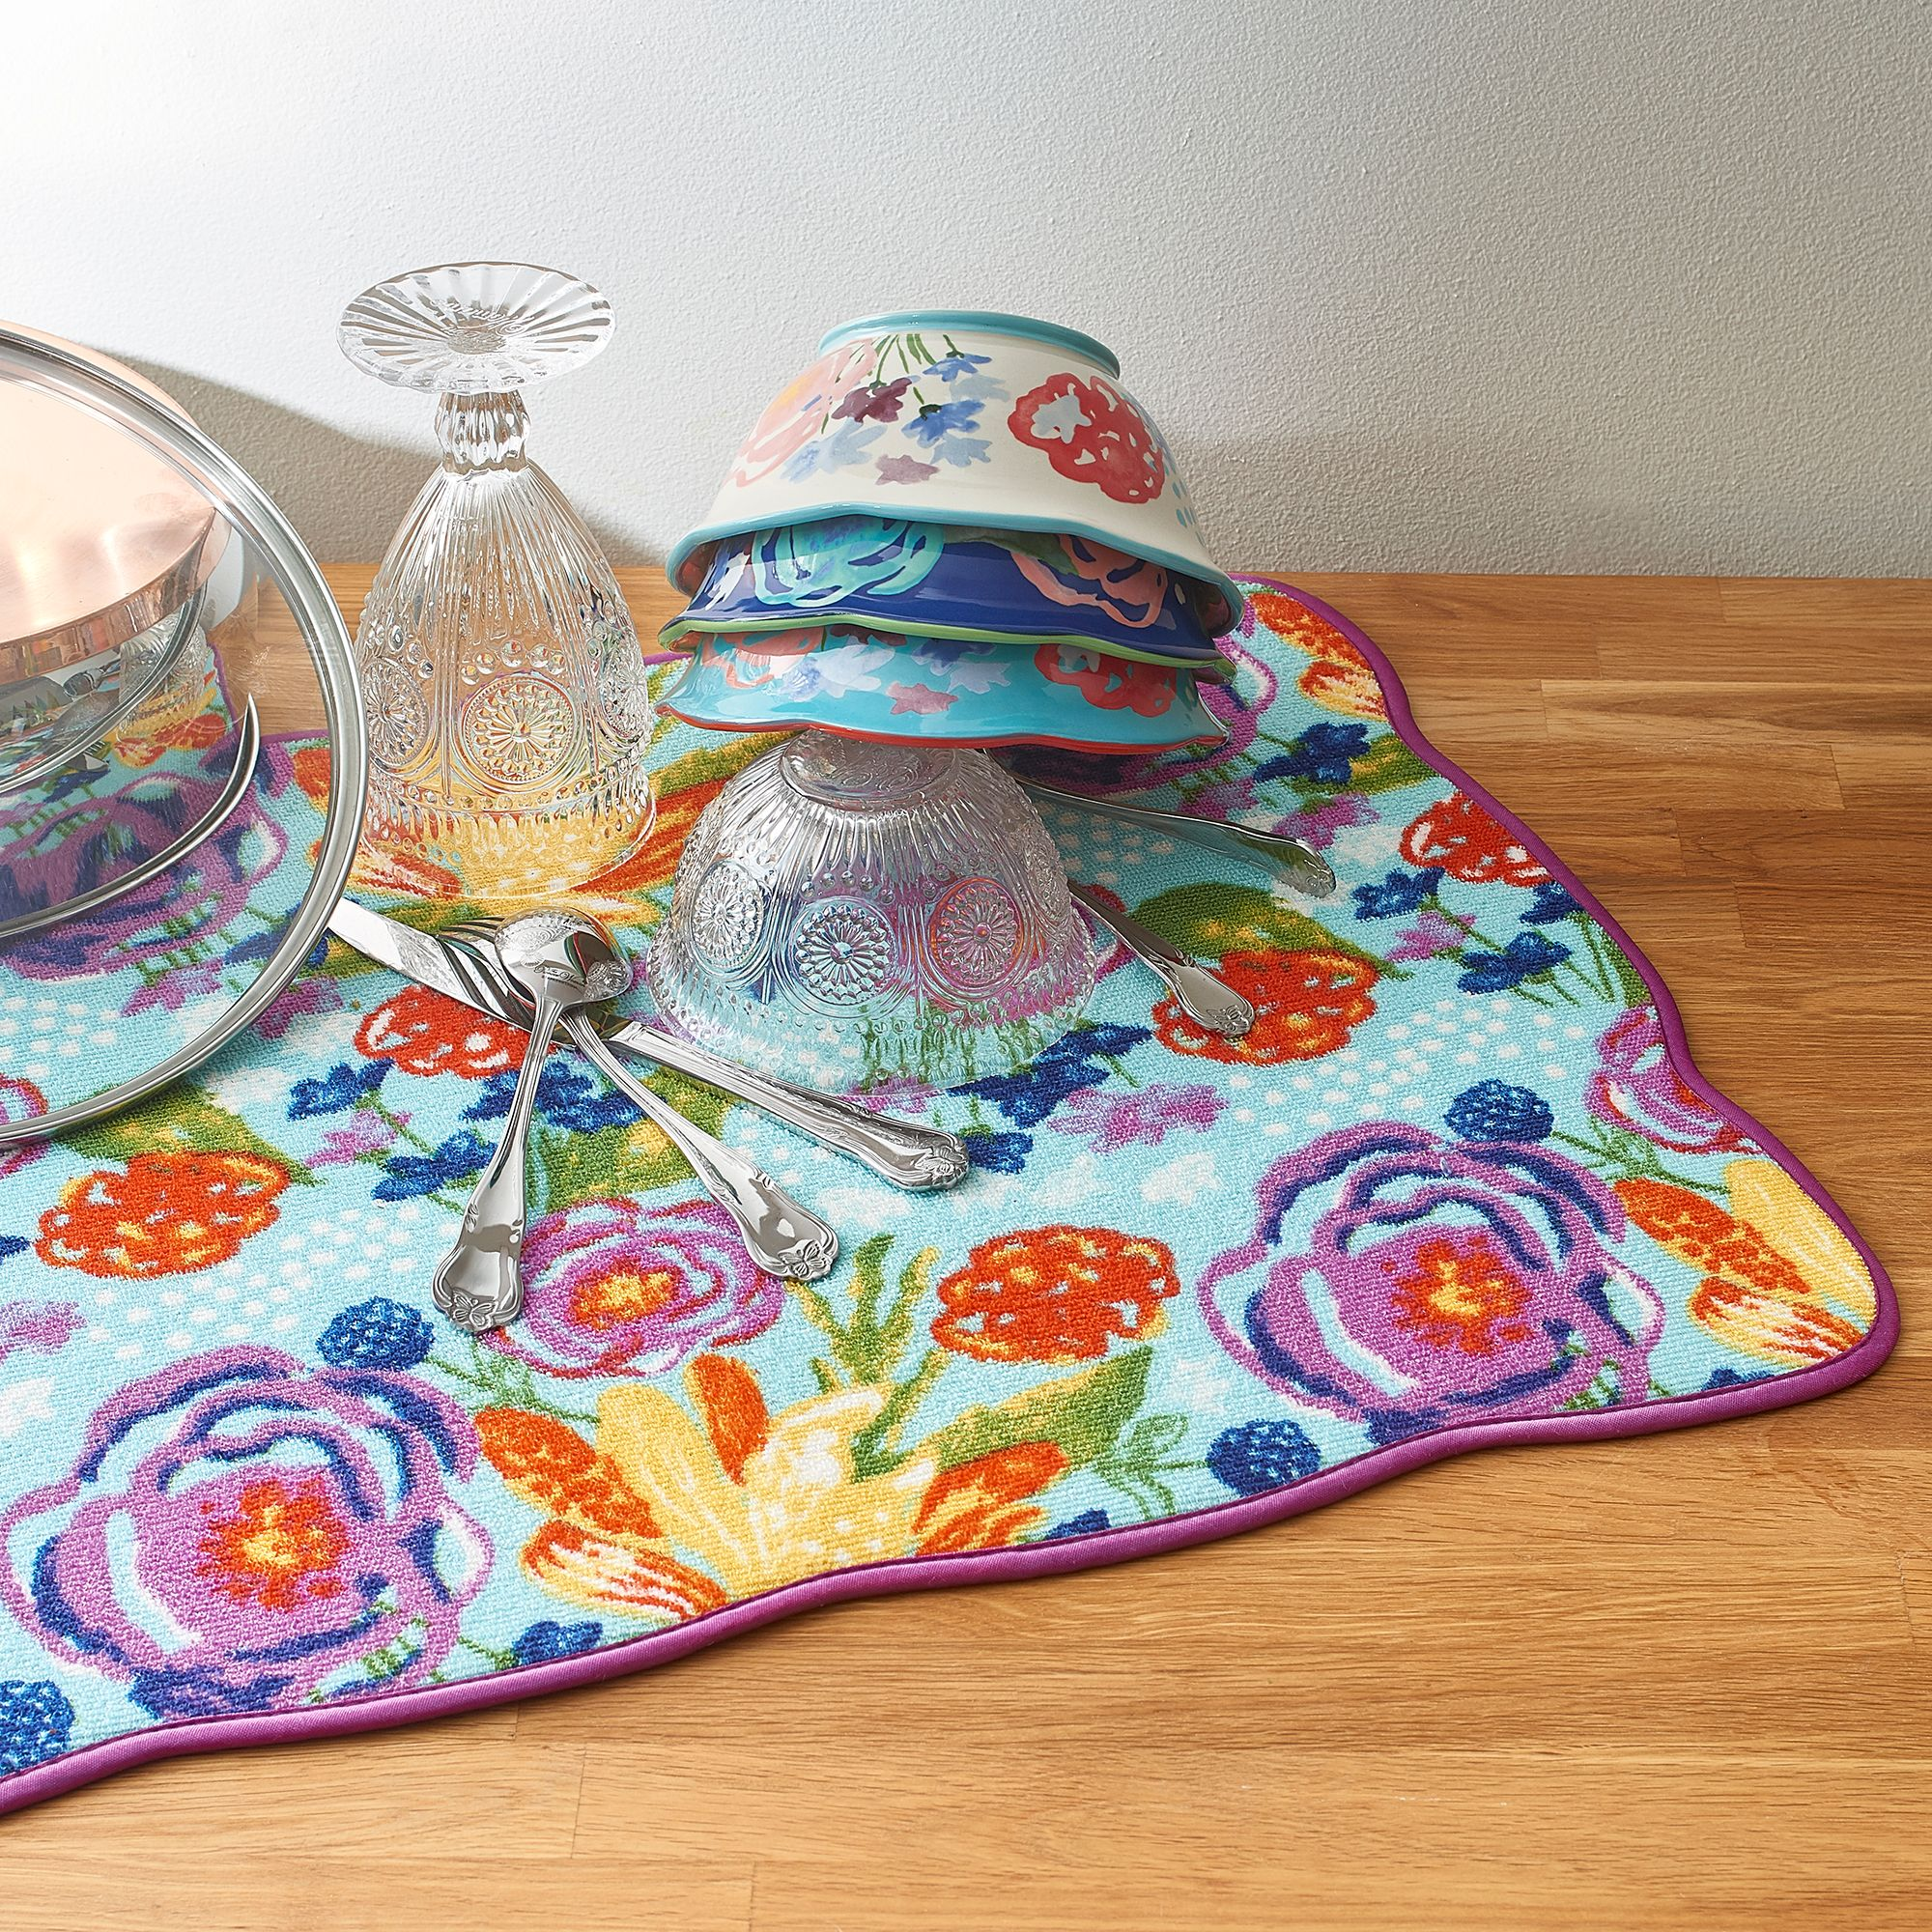 The Pioneer Woman Celia Reversible Dish Drying Mat 18x24